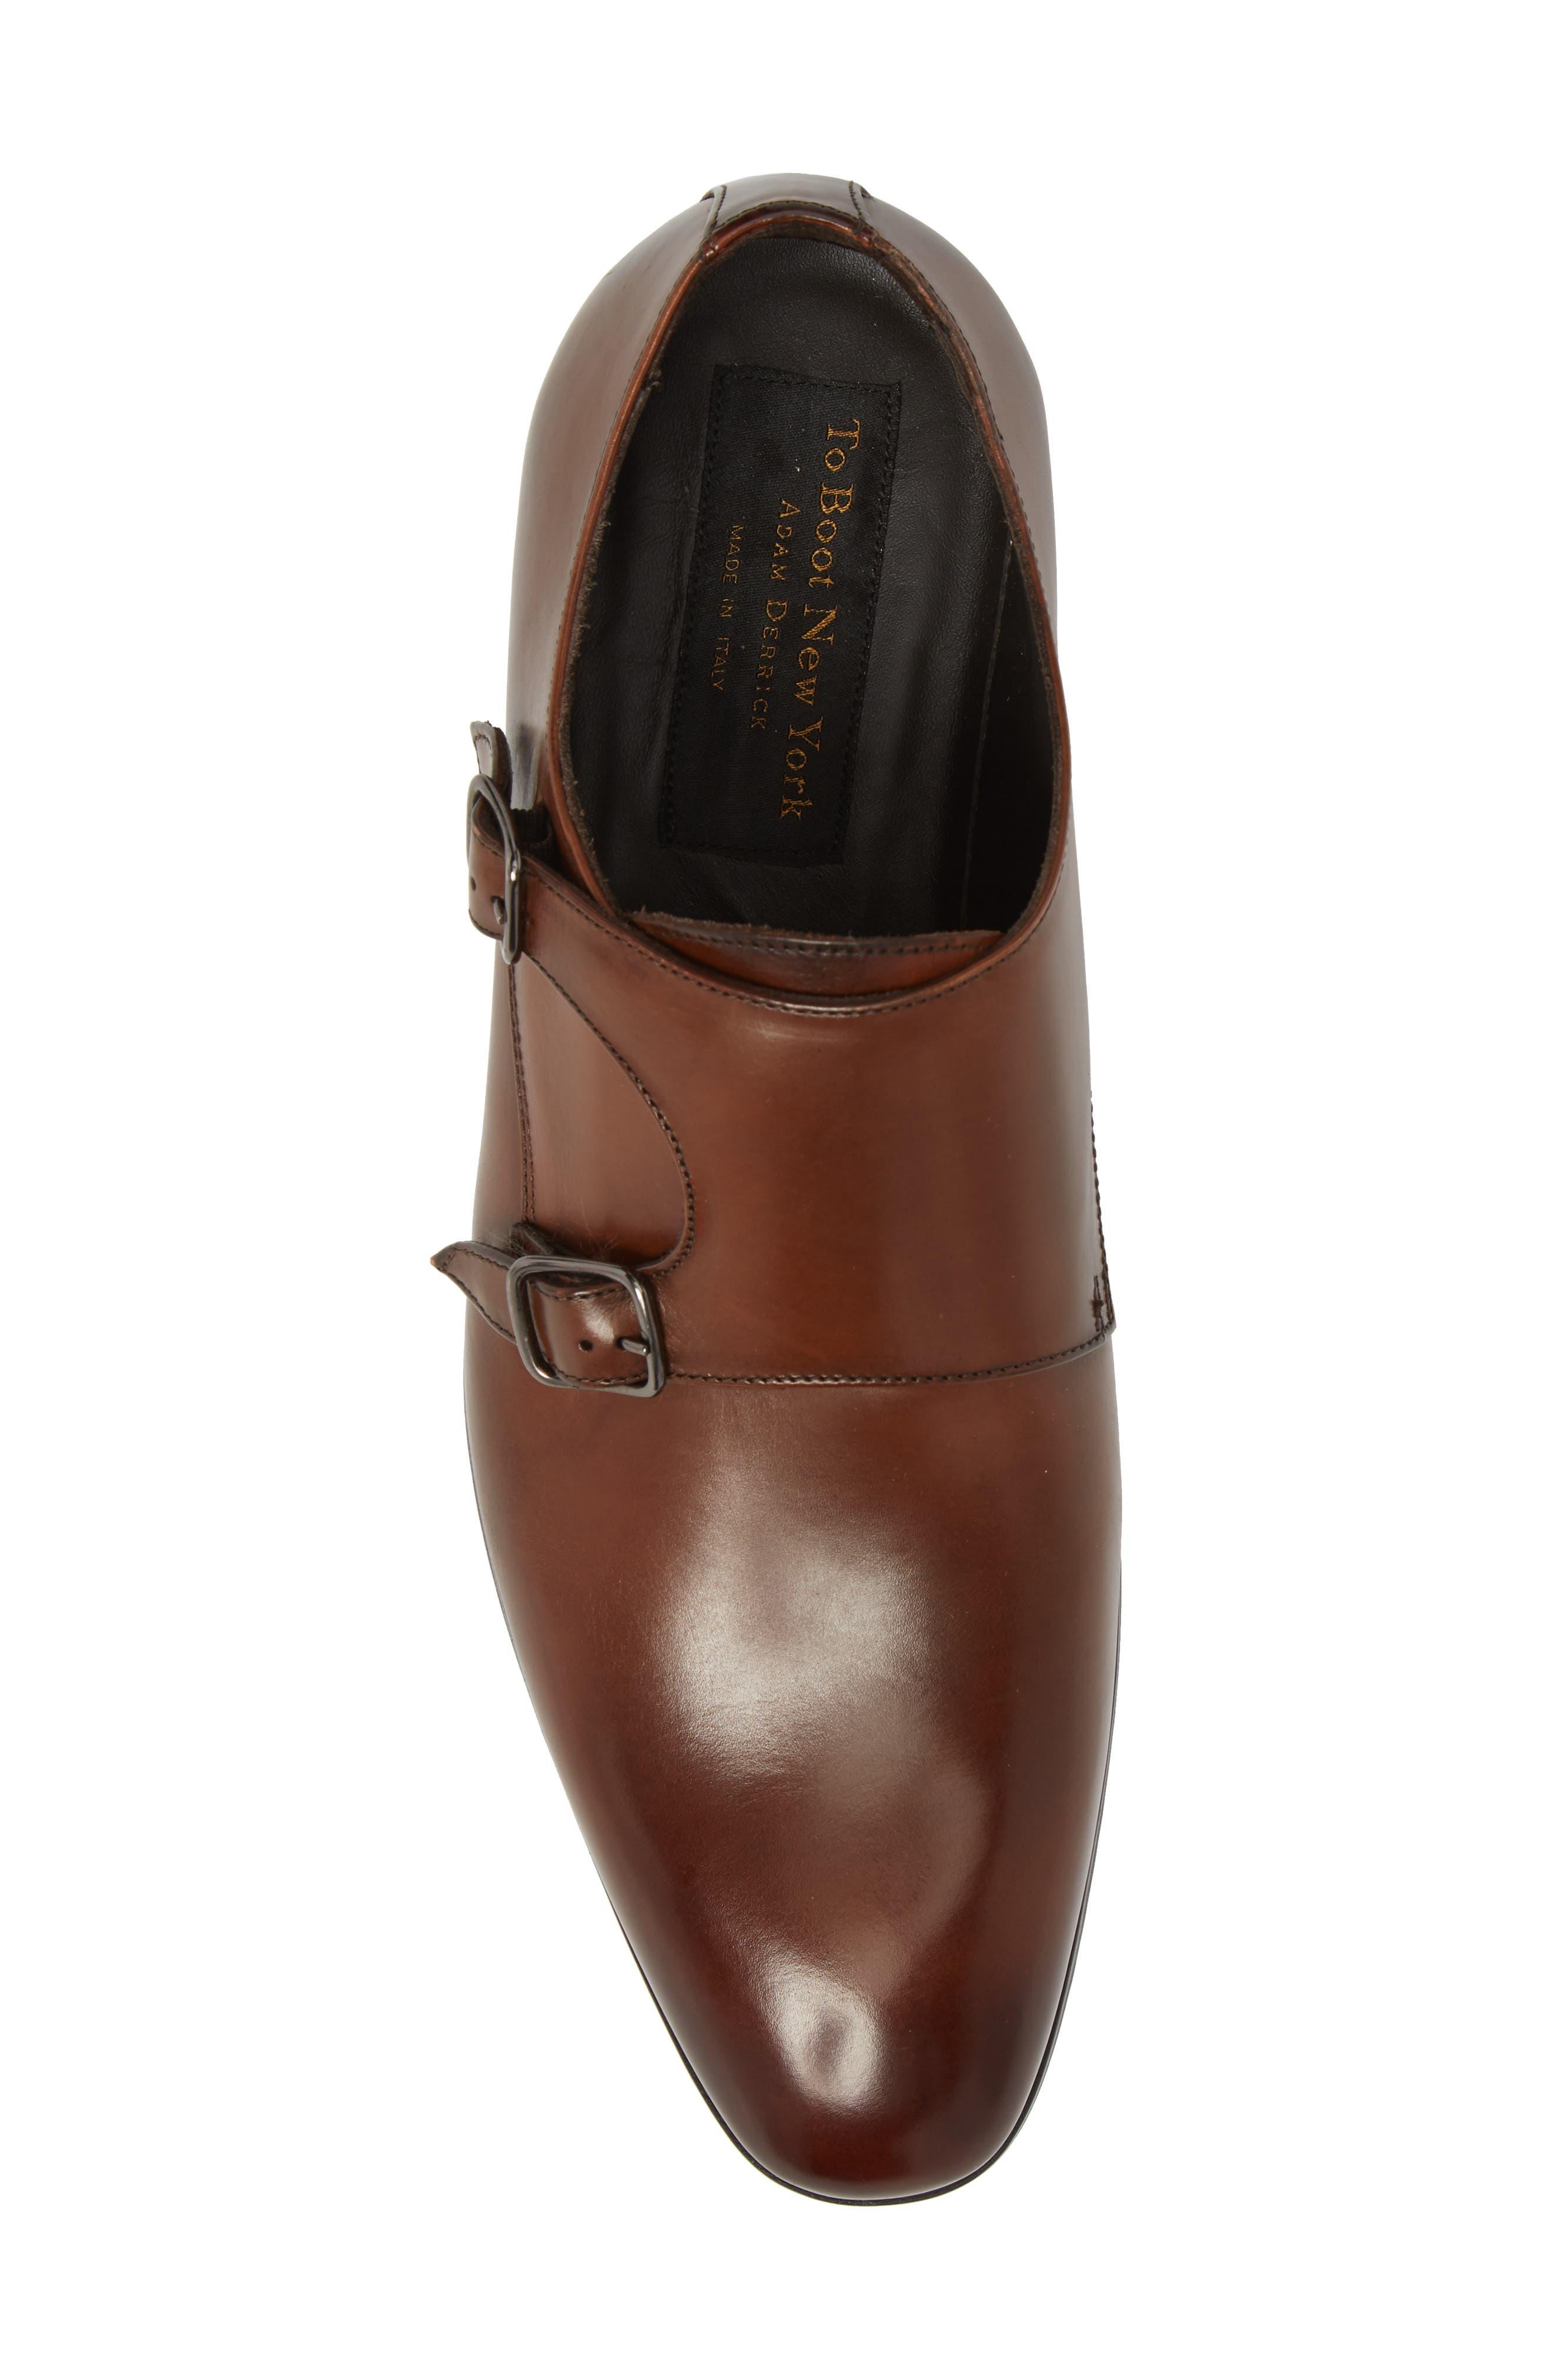 Benjamin Double Monk Strap Shoe,                             Alternate thumbnail 5, color,                             TMORO LEATHER